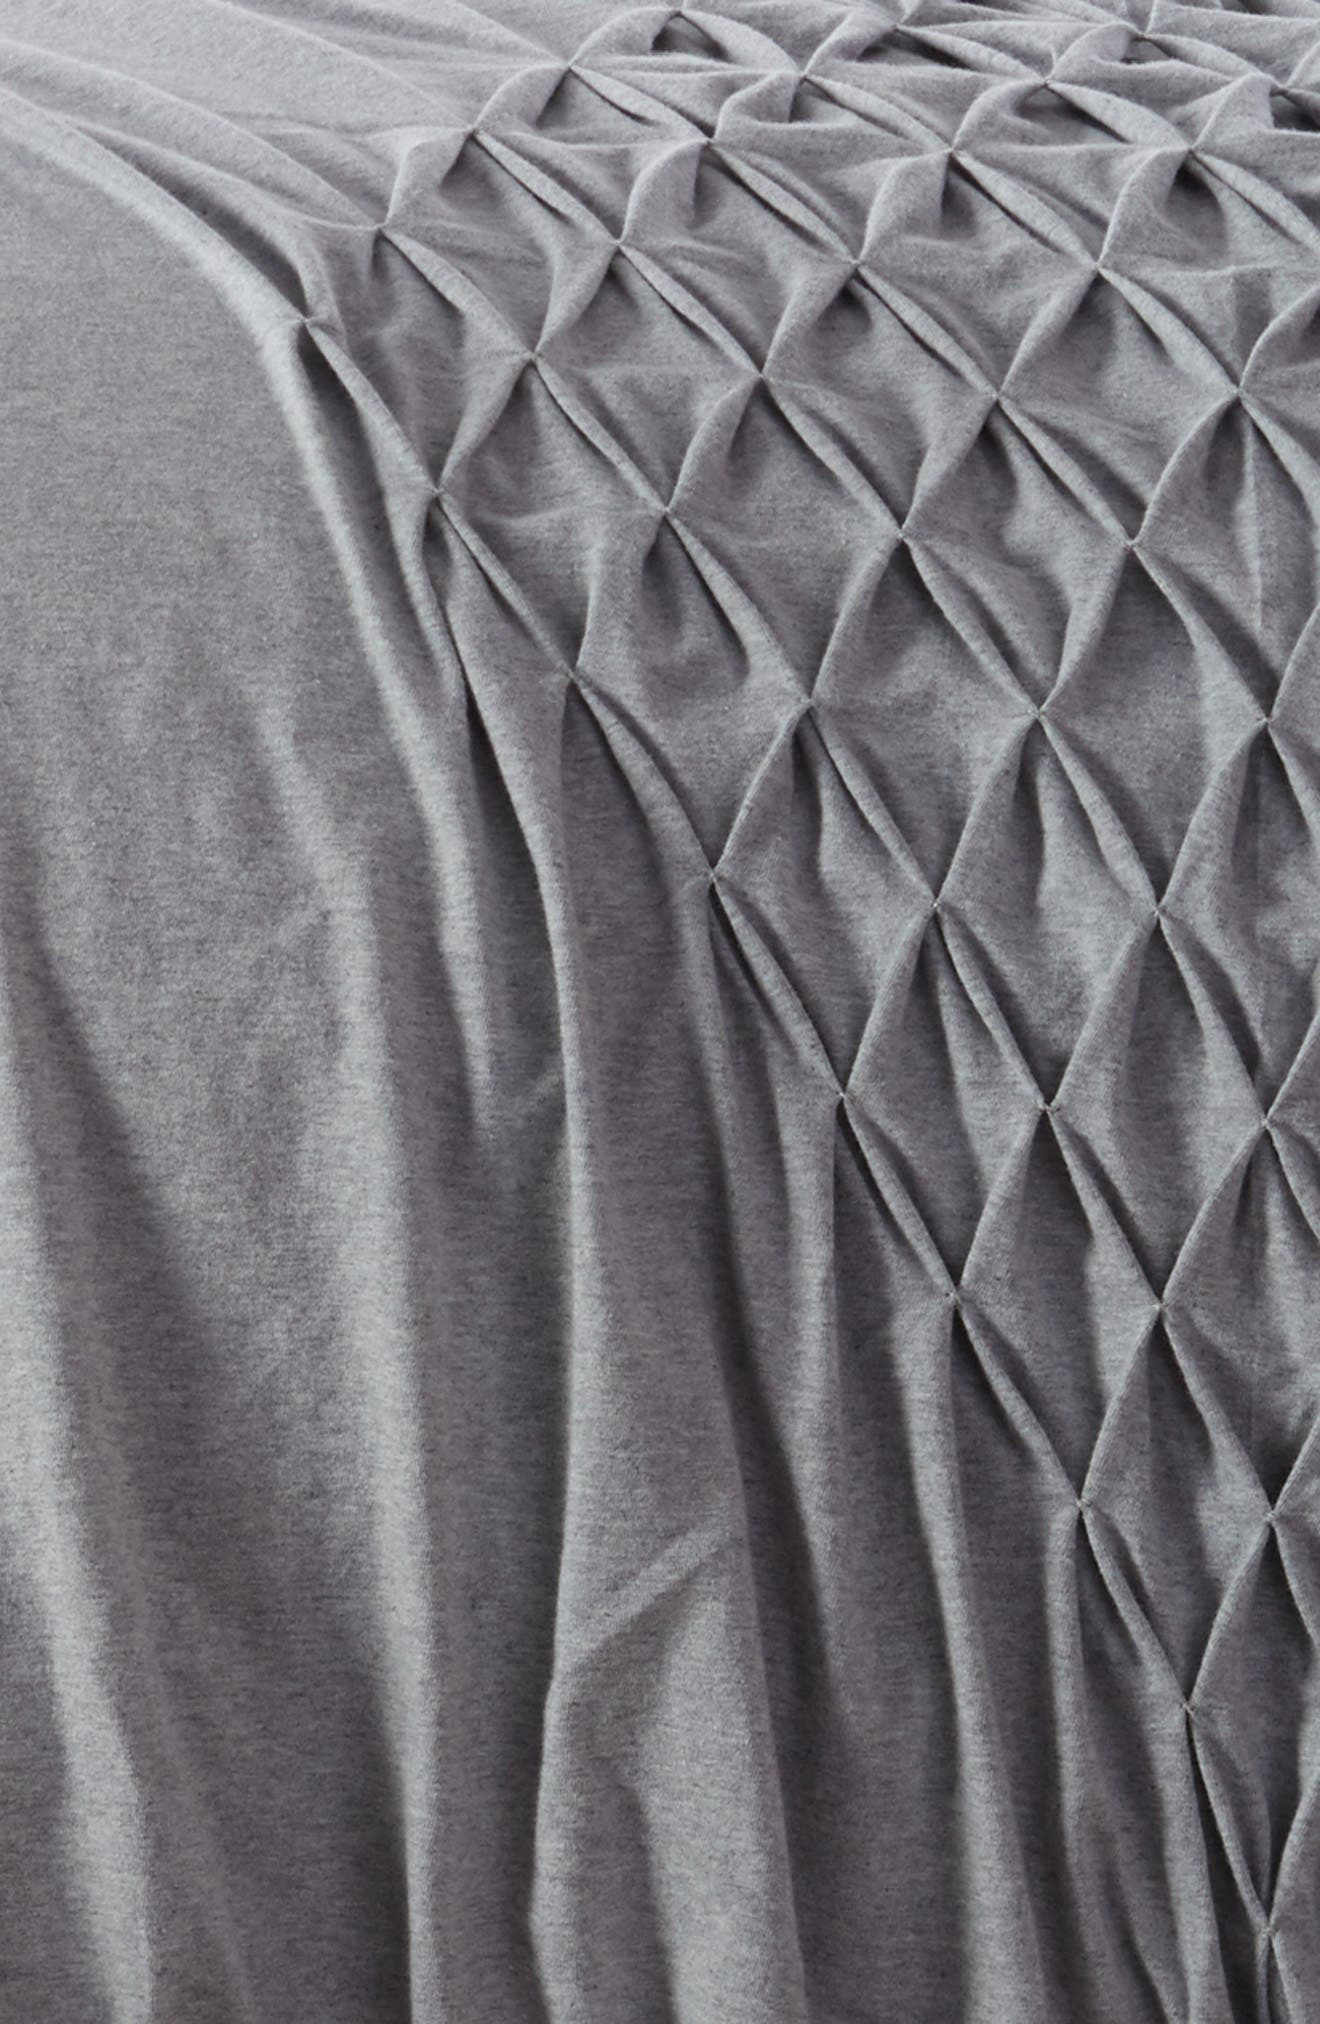 Diamond Smocked Duvet Cover,                             Alternate thumbnail 2, color,                             Grey Heather